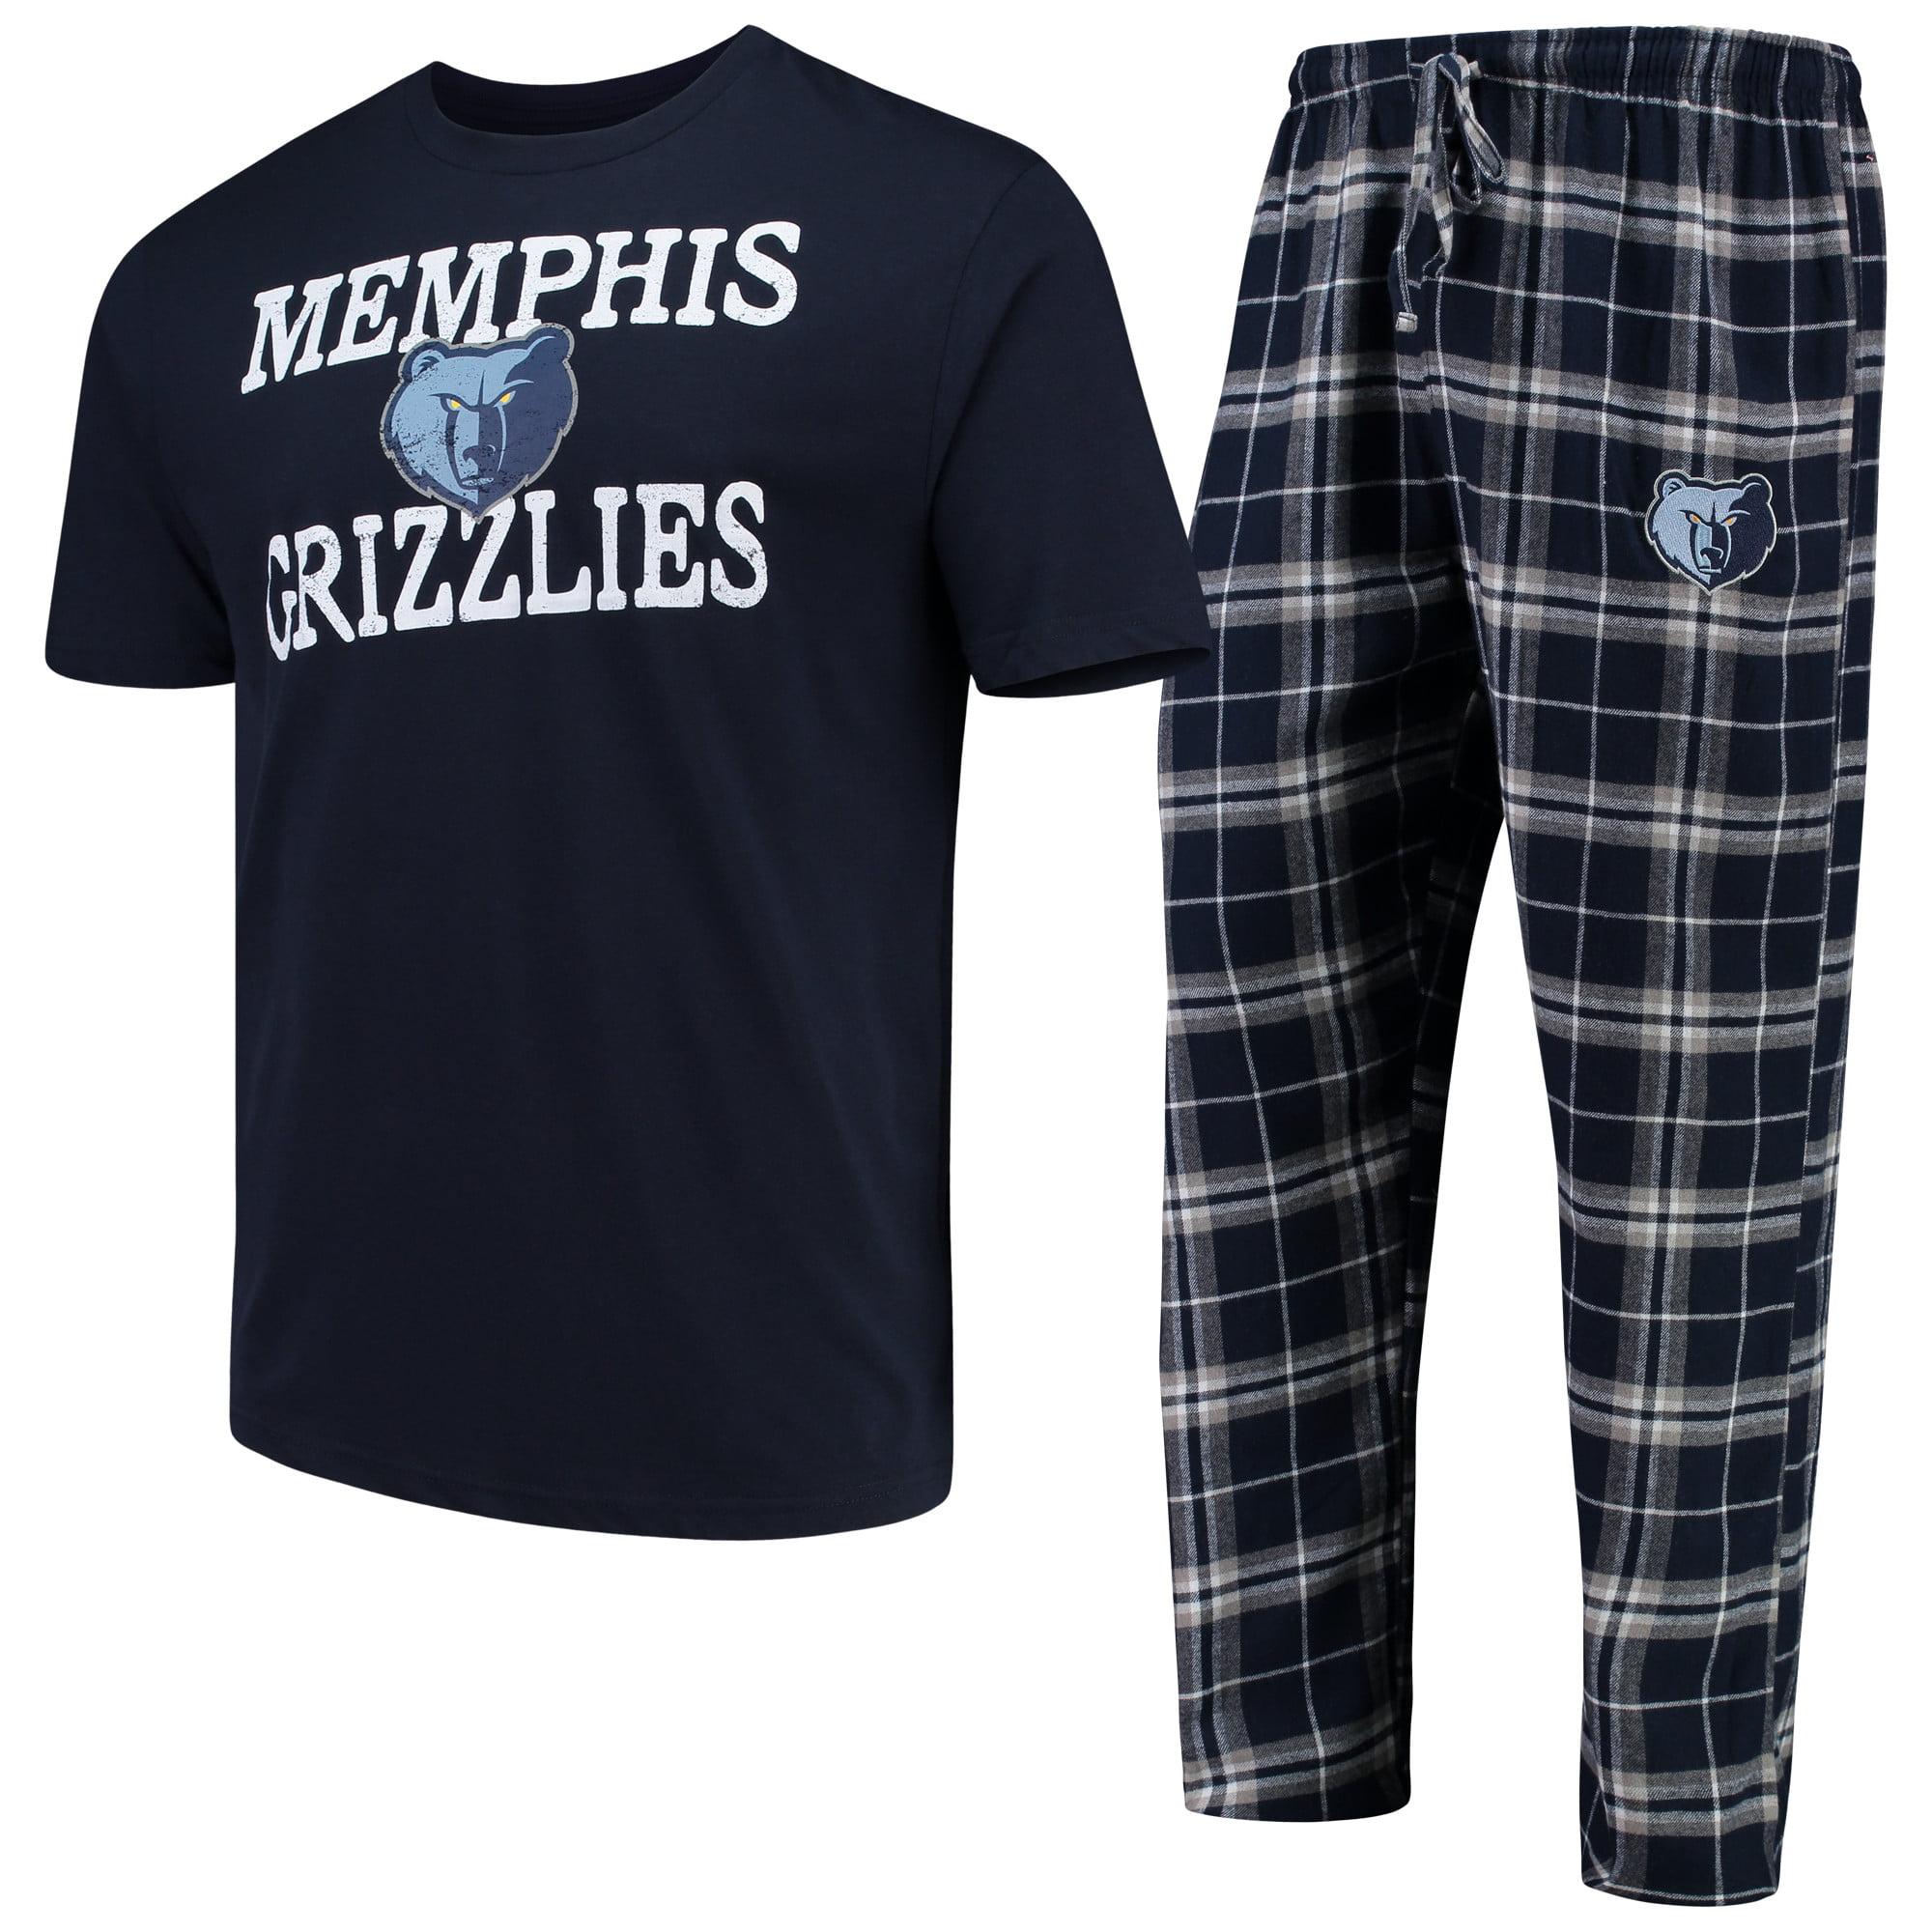 Memphis Grizzlies Concepts Sport Duo T-Shirt & Pants Sleep Set - Navy/Gray